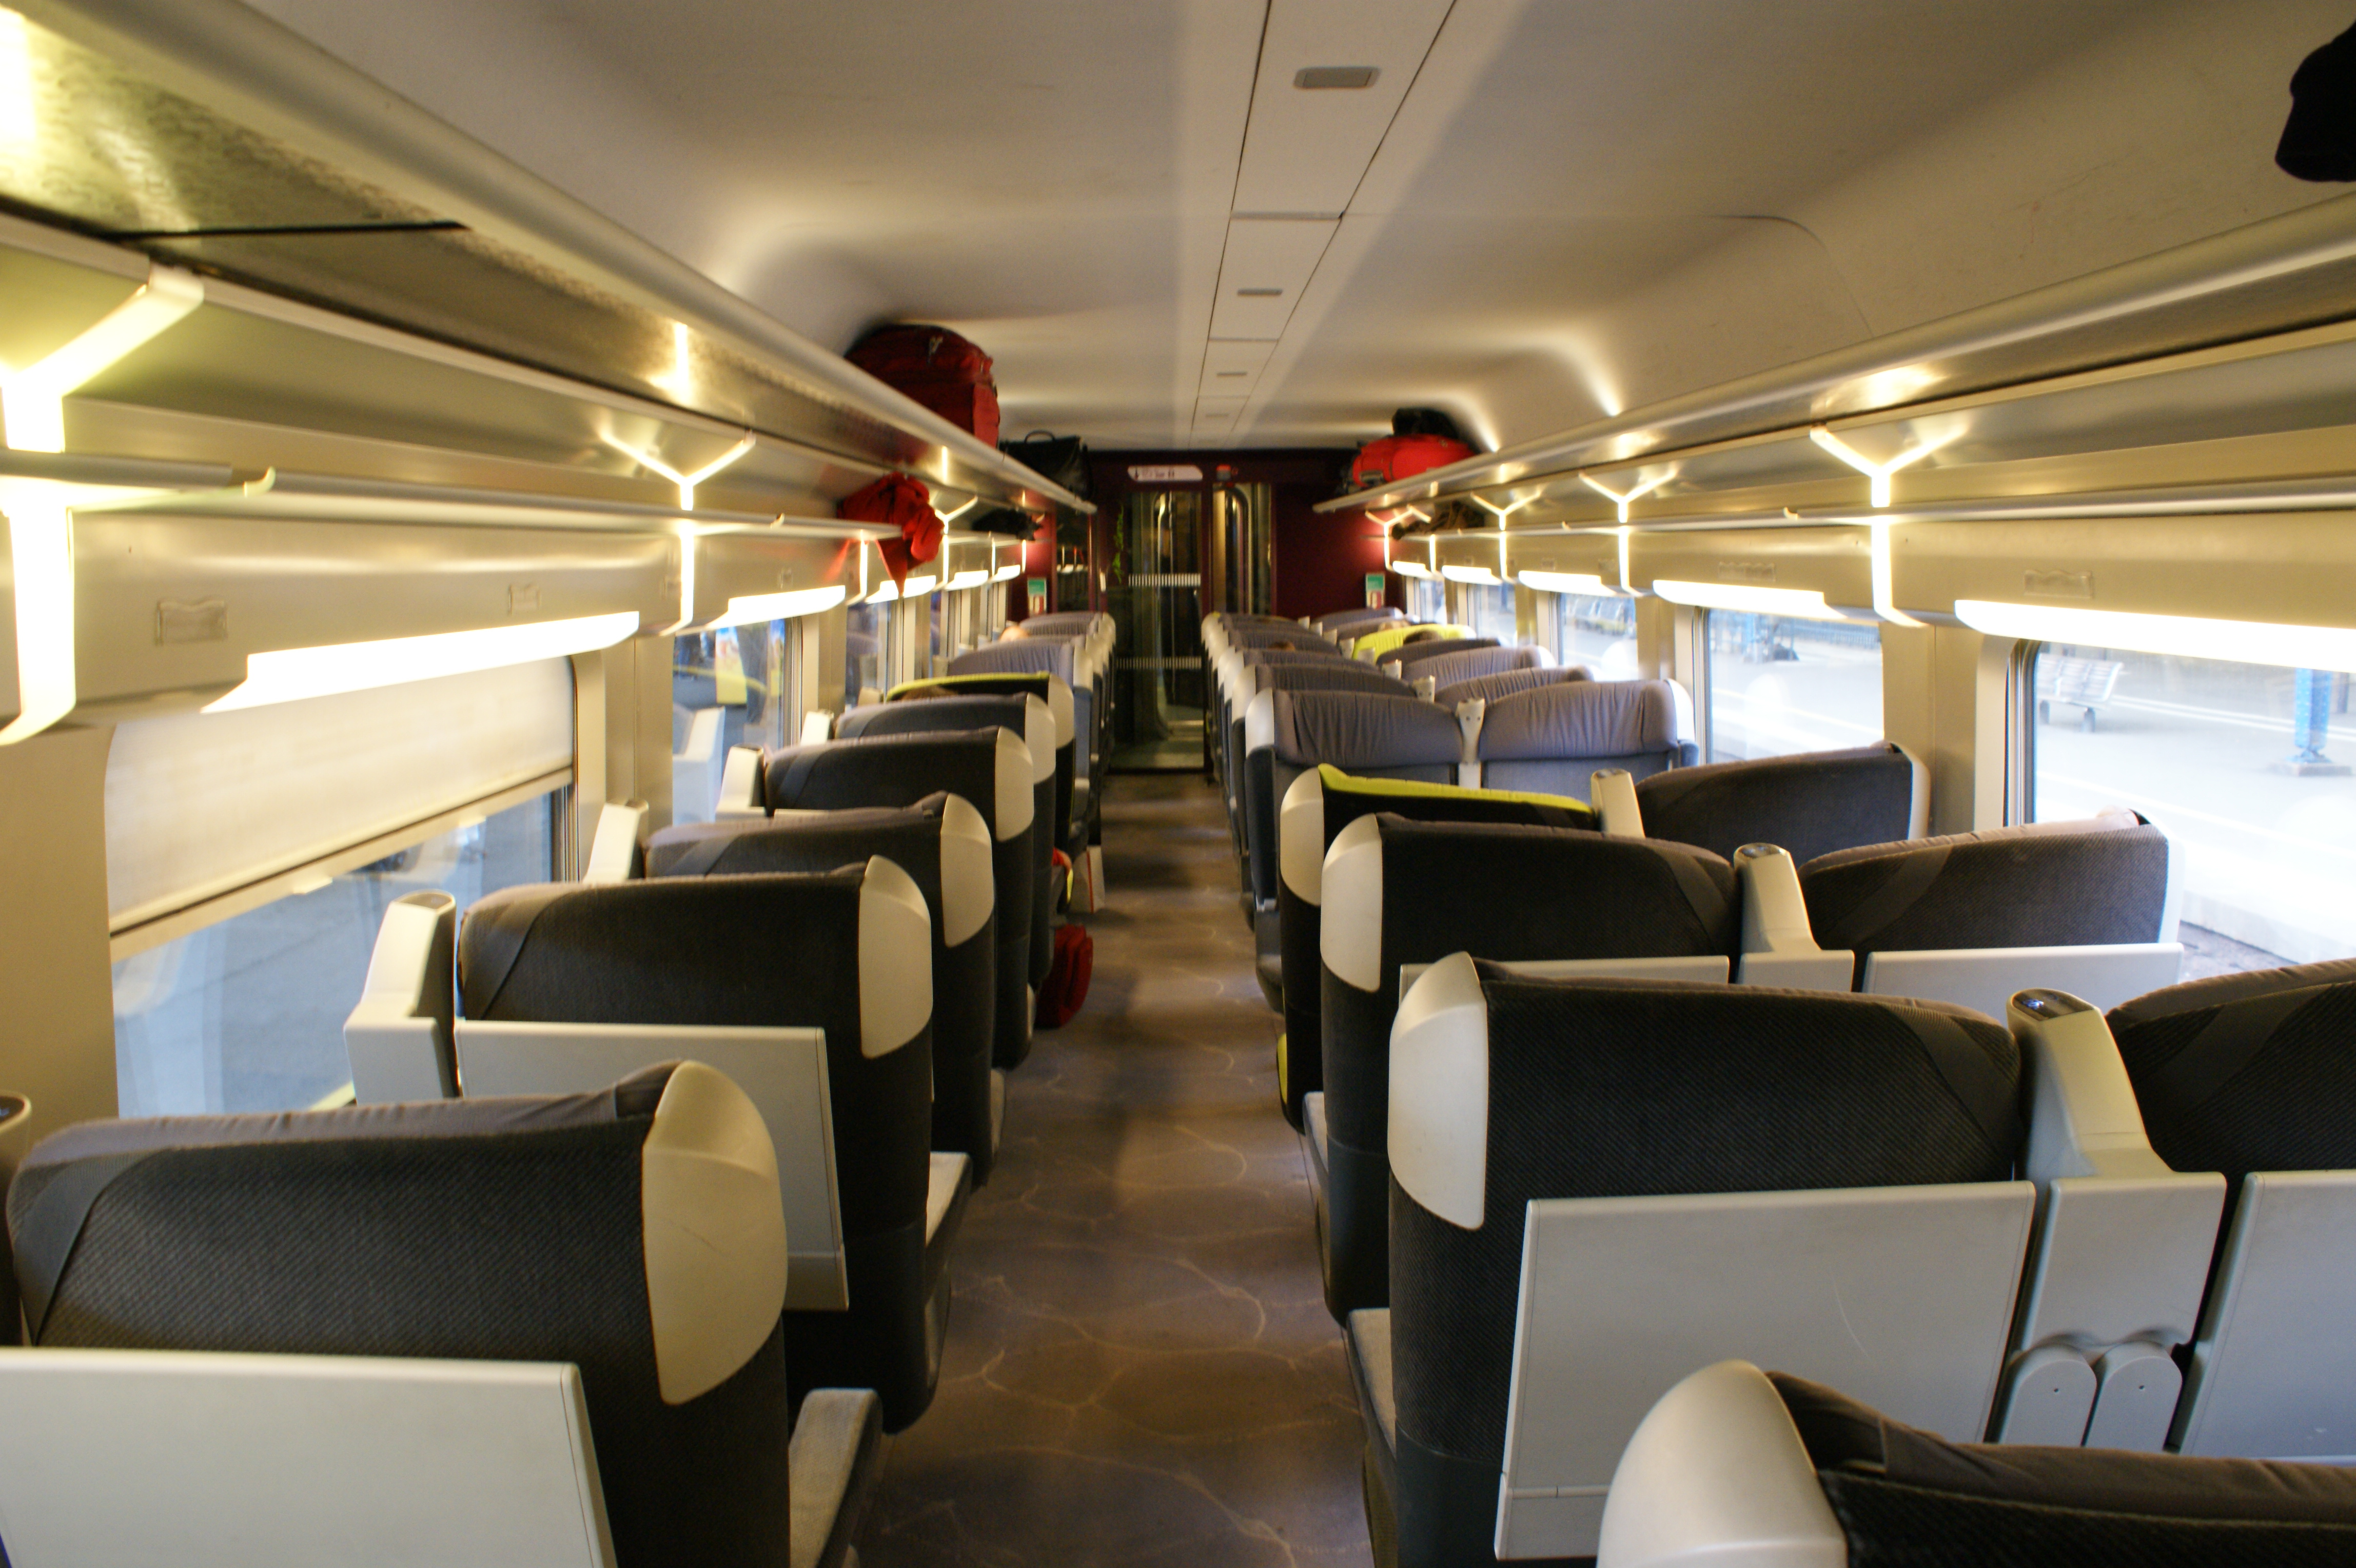 Best Economy Class Seat Design